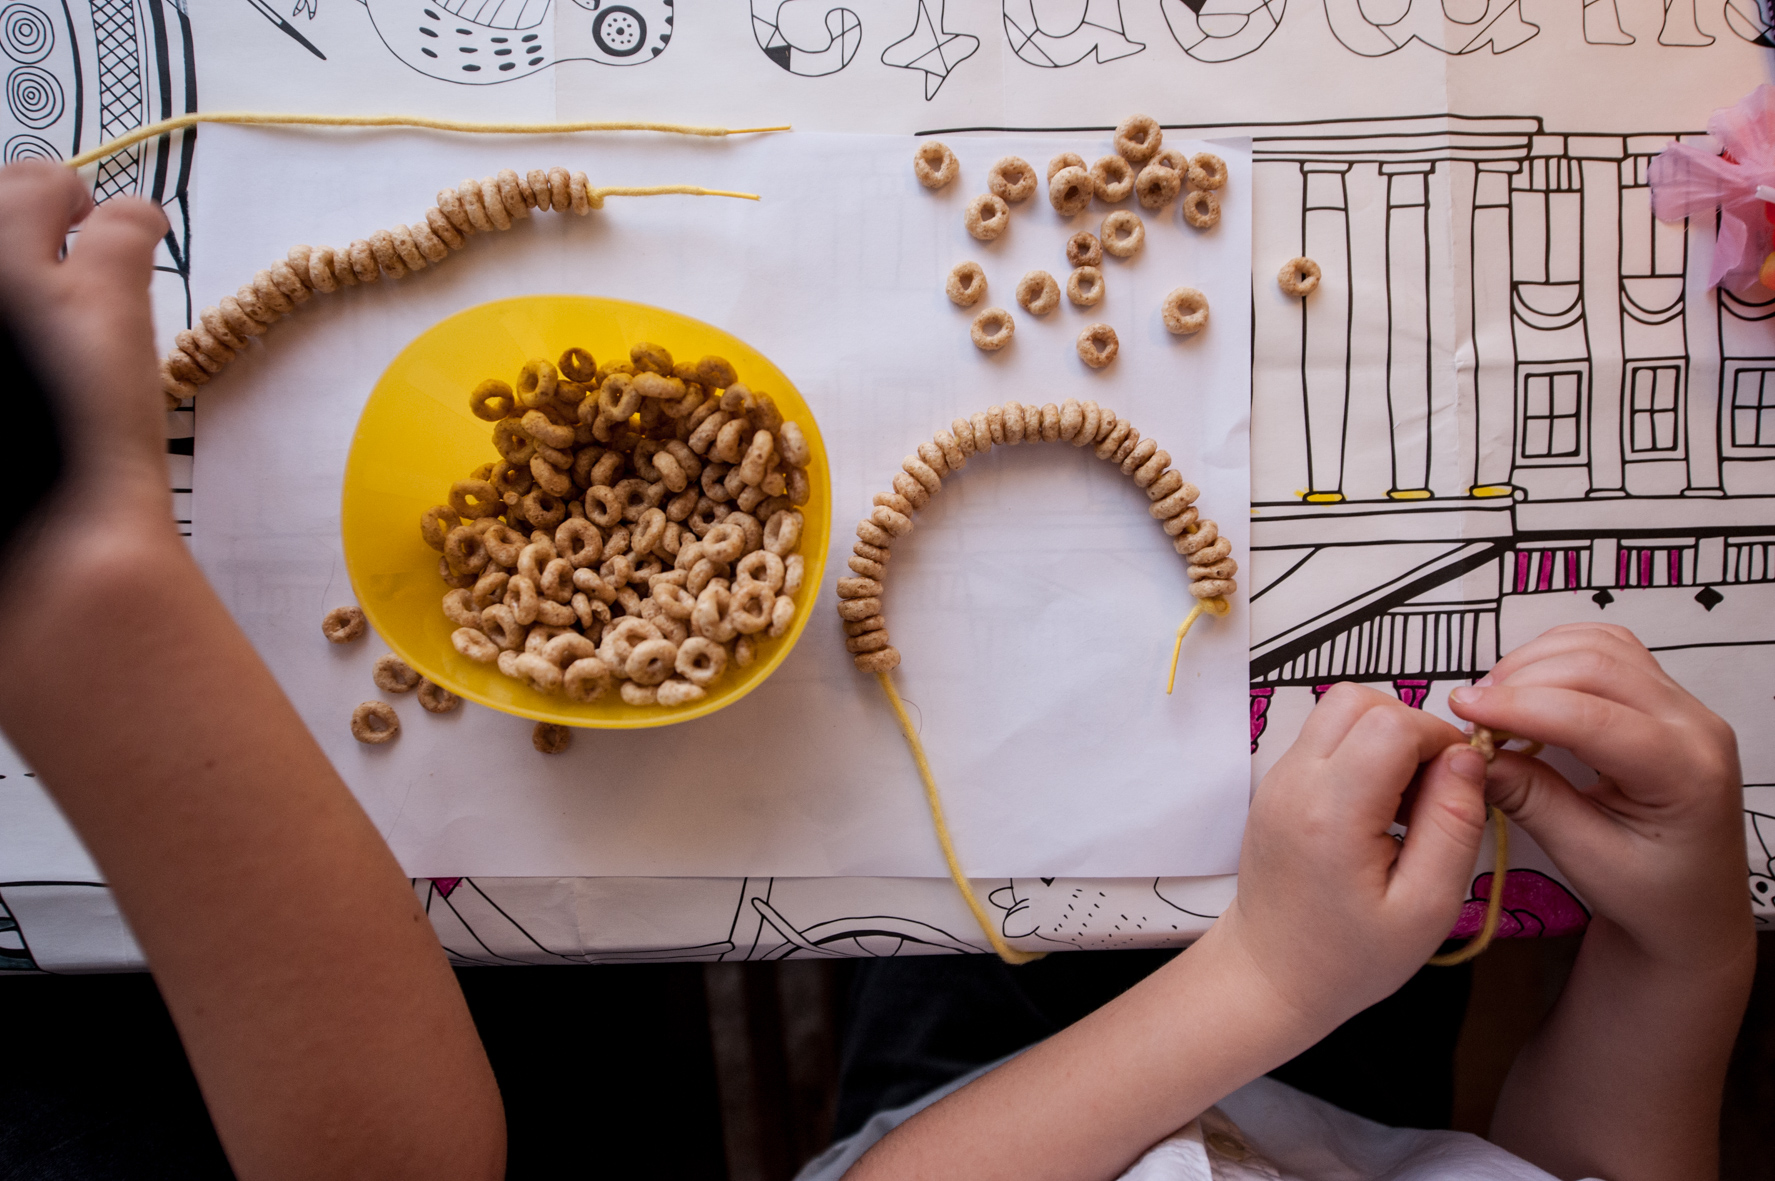 Threading cheerios - necklace in progress